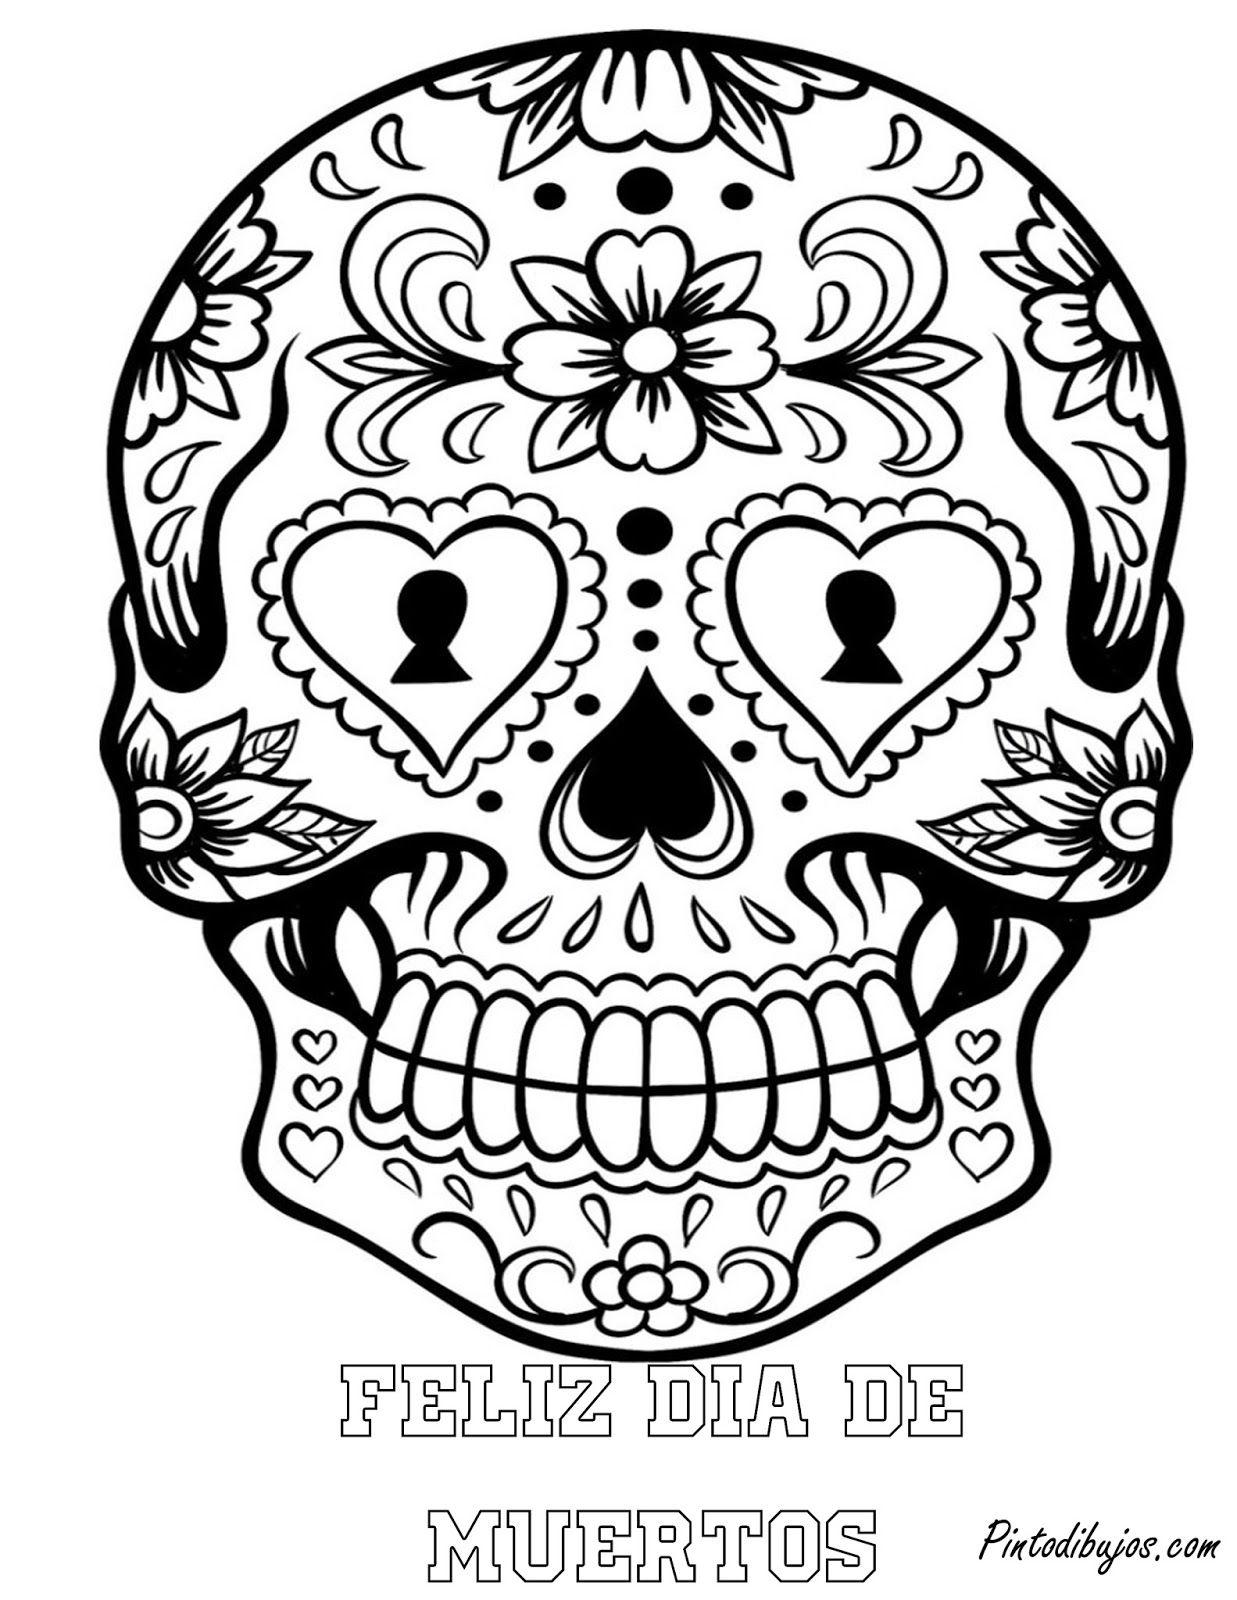 Feliz dia de muertos | mascara de calavera de dia de muertos | dia ...